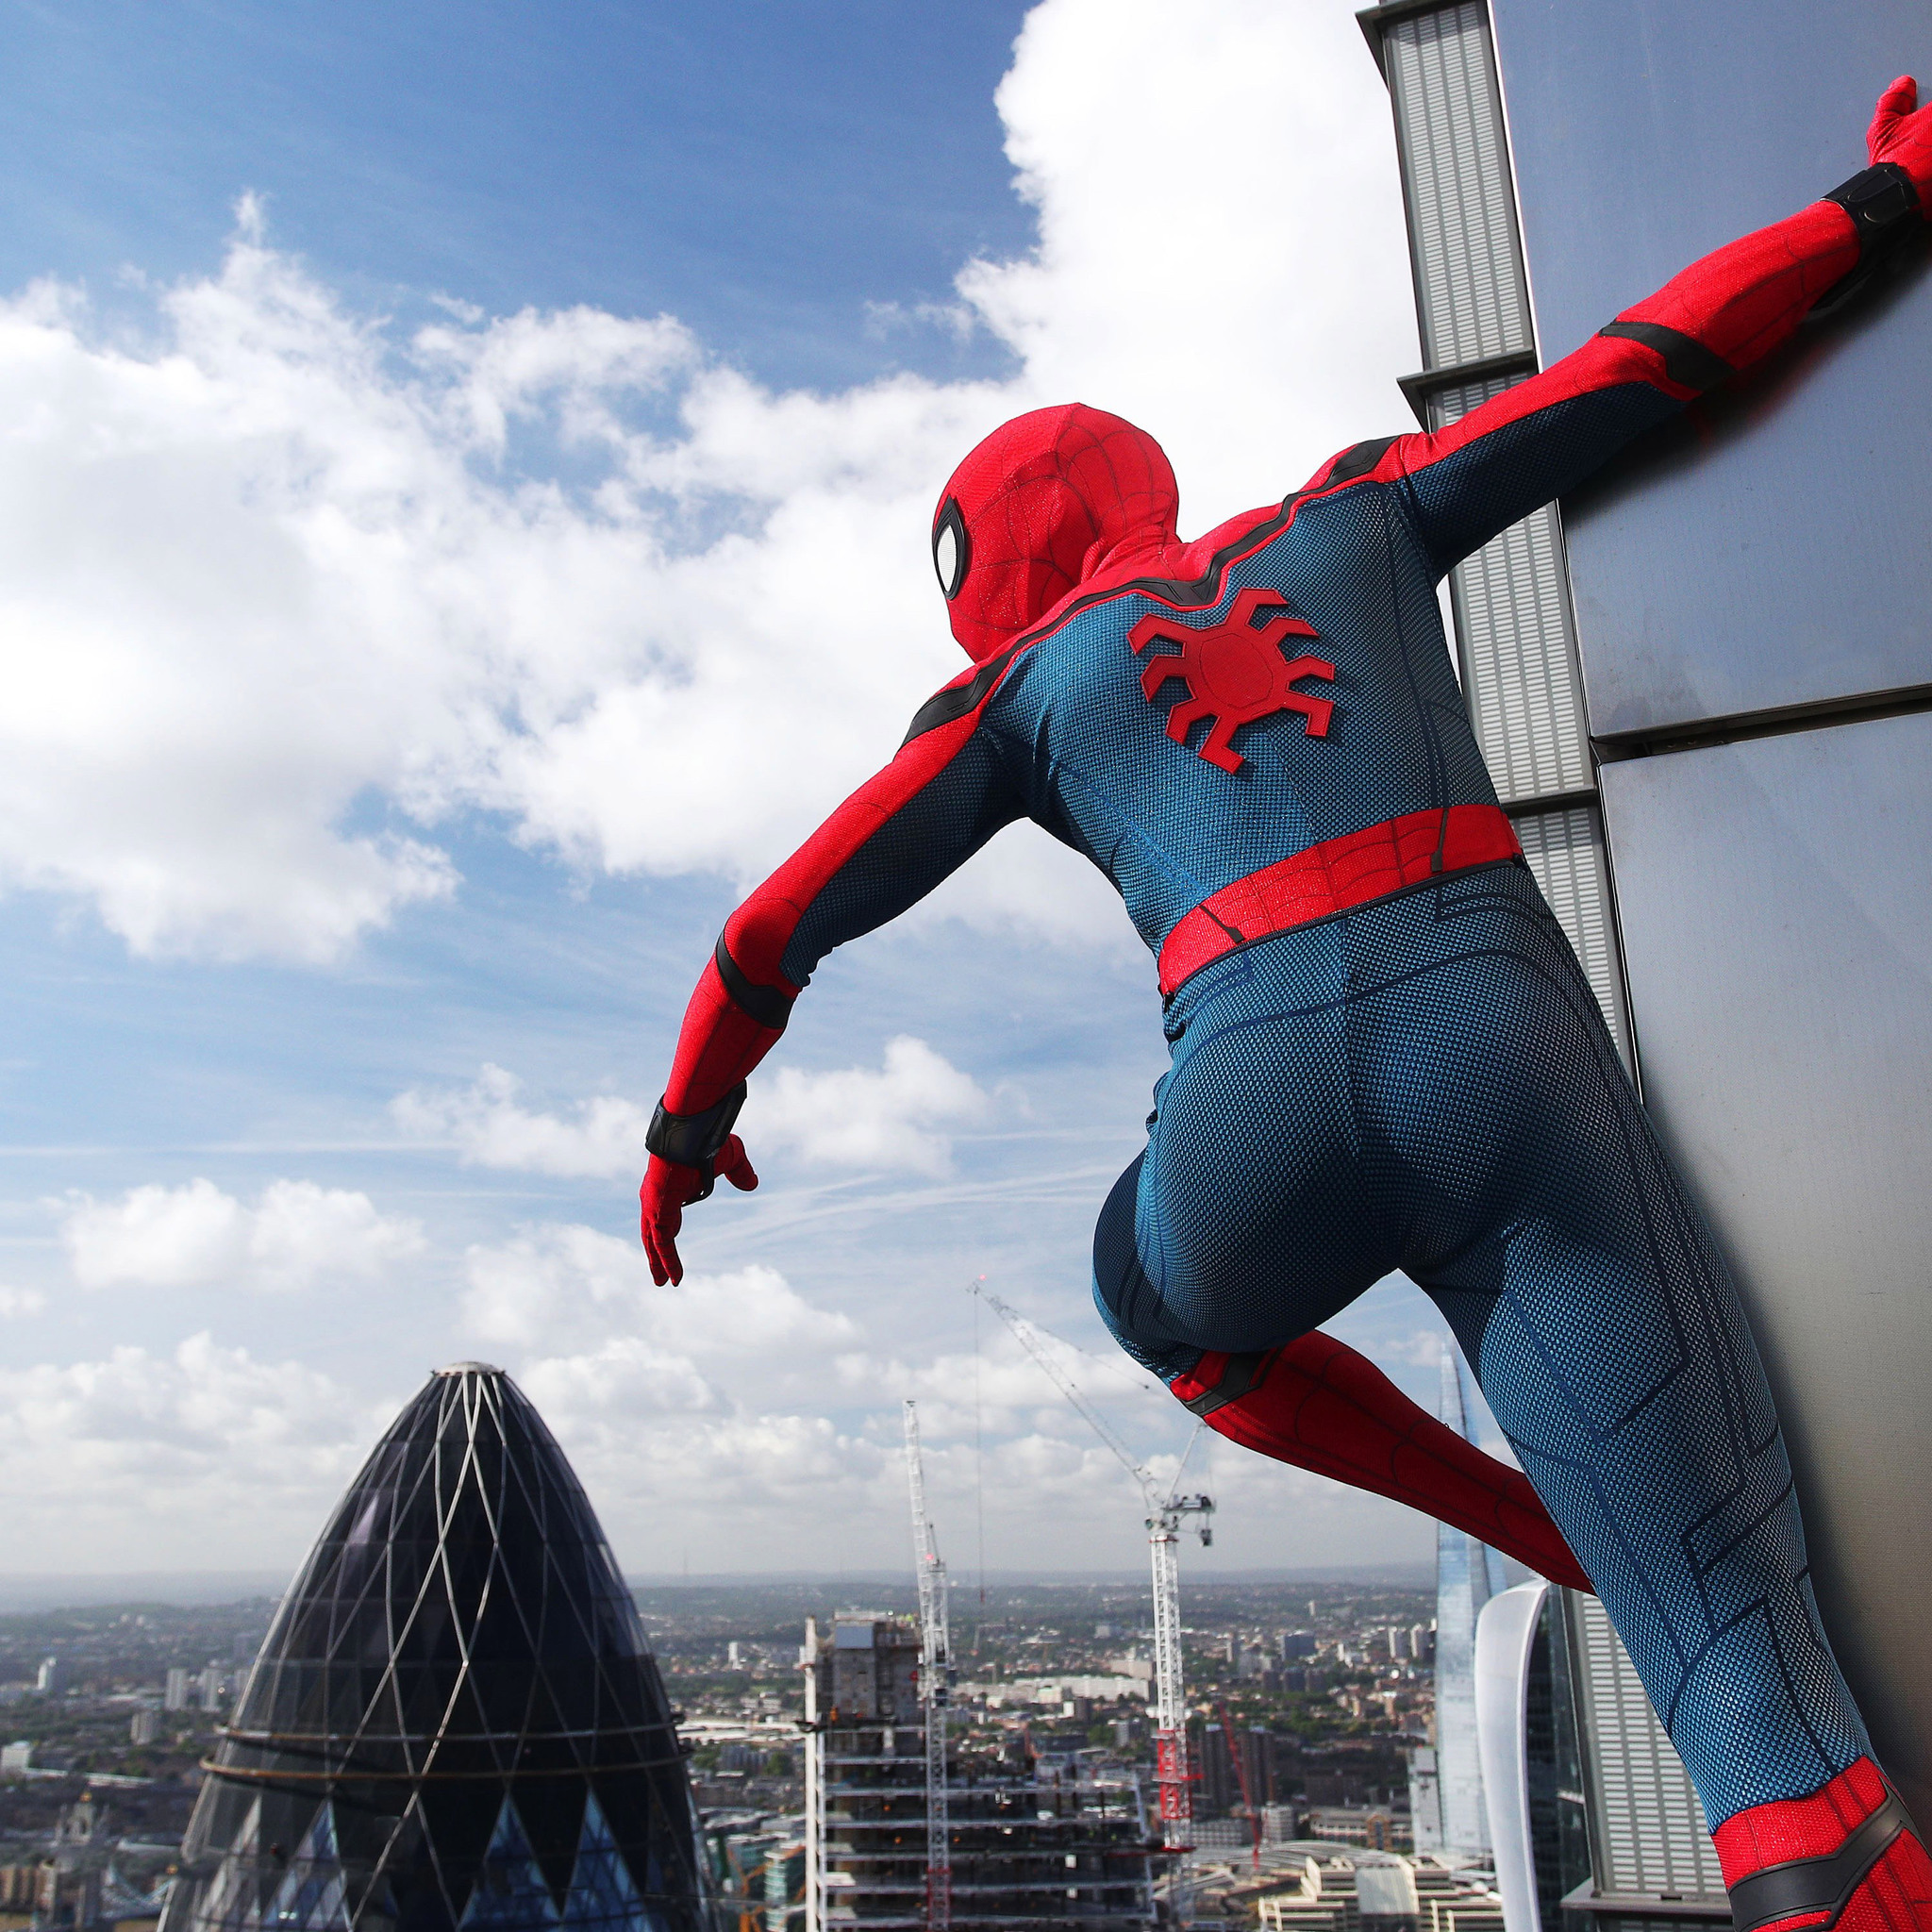 spiderman-homecoming-movie-2017-4k-lf.jpg